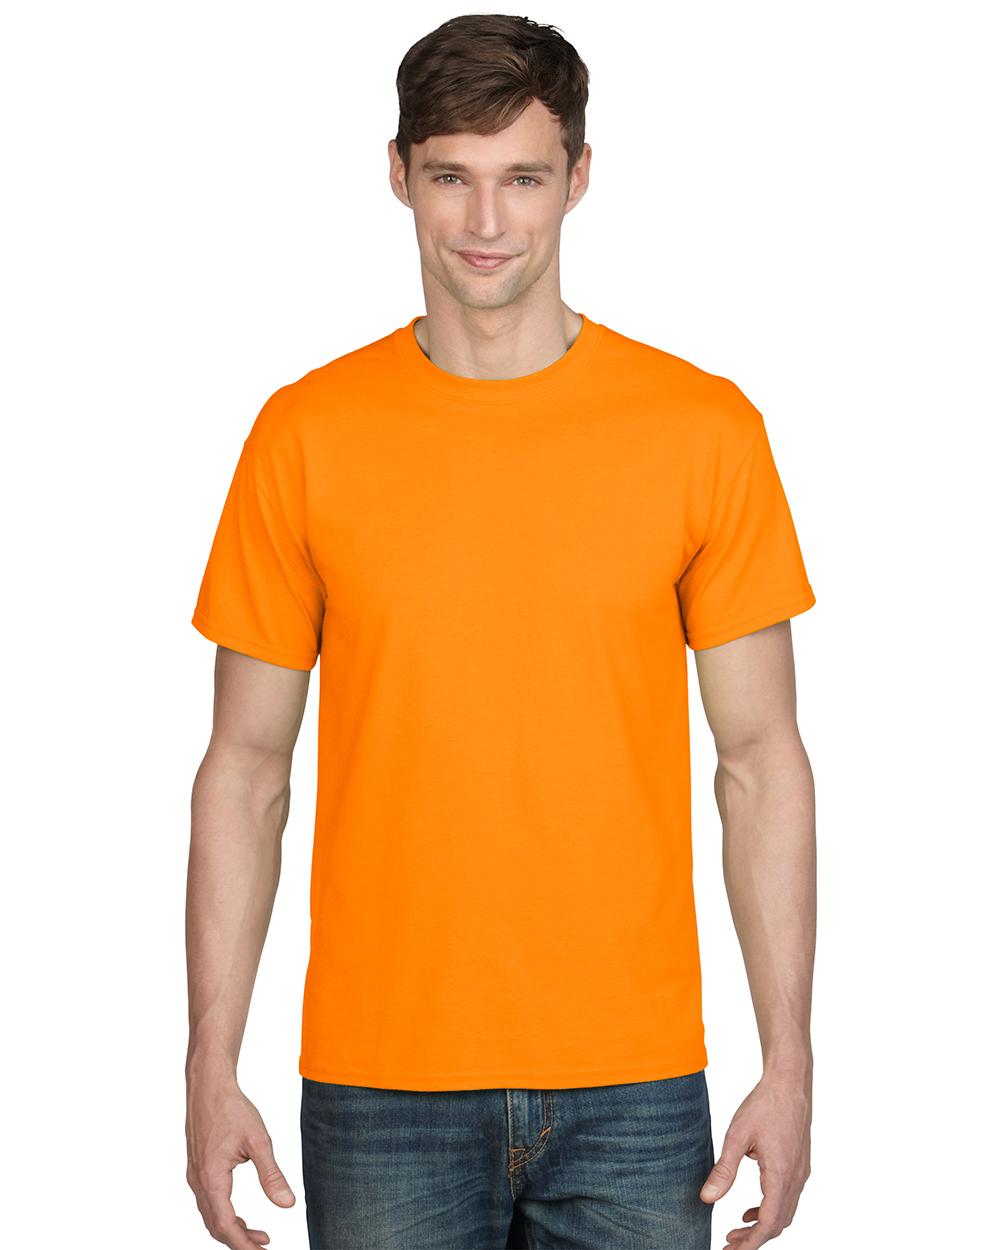 Gildan 8000     DryBlend™    Classic Fit Adult T-Shirt    5.6 oz. 50% Cotton/50% DryBlend Polyester